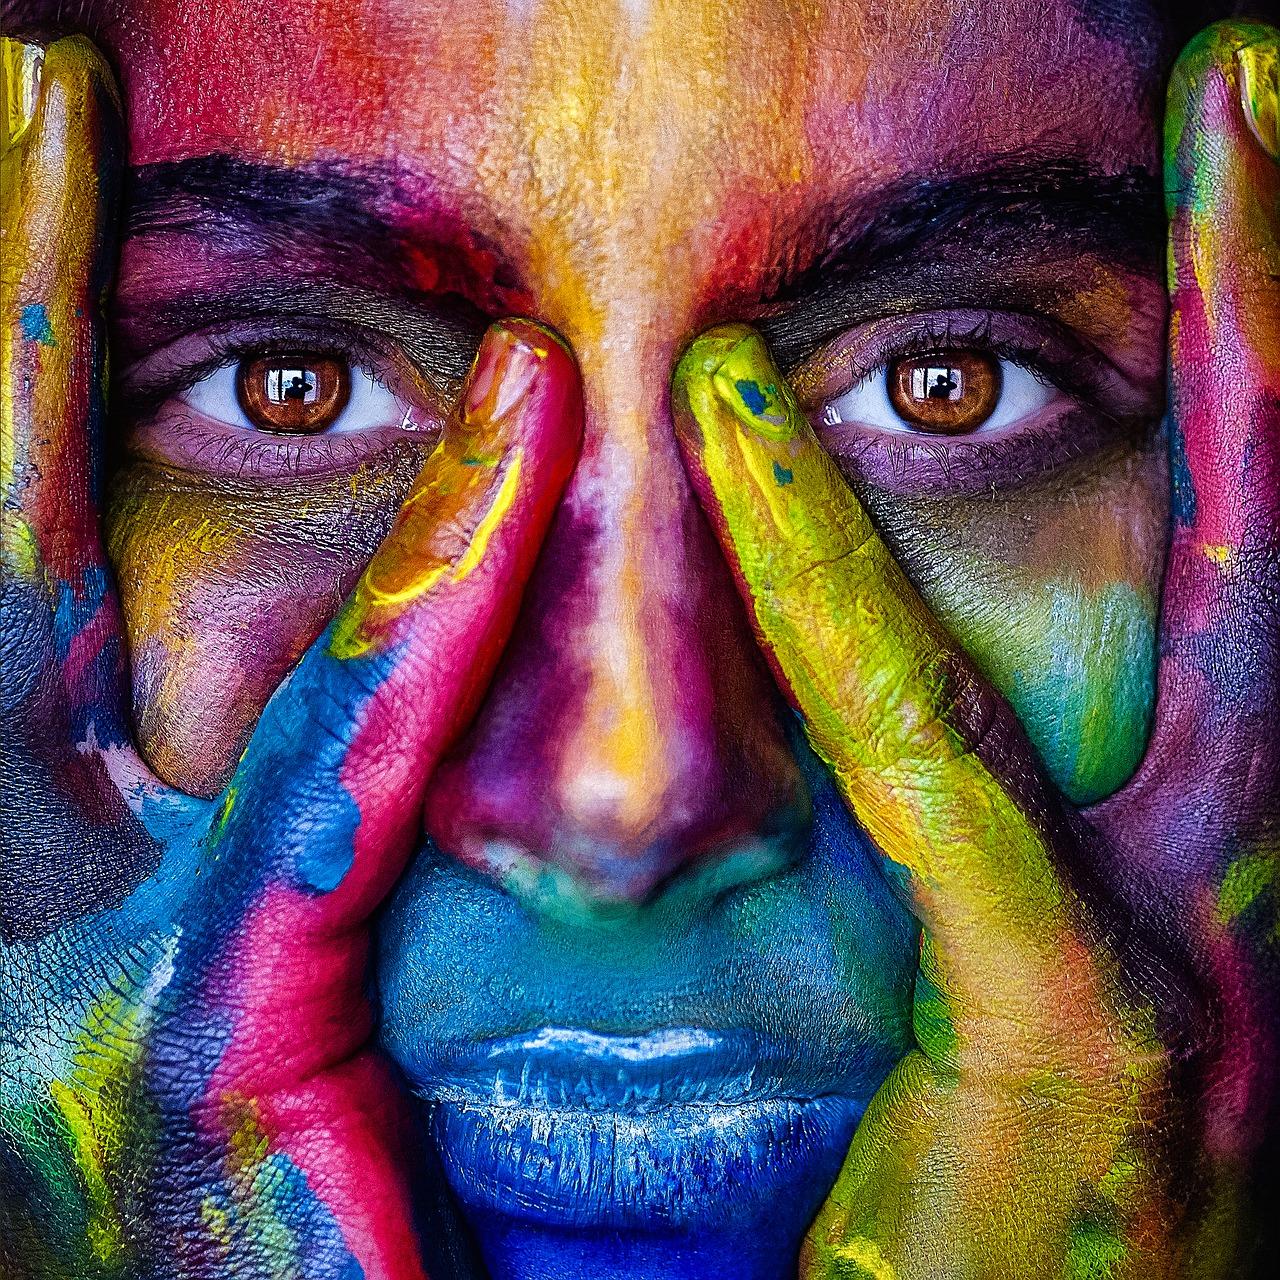 sophrologie-hypnose-emdr-sandrine-le-gall-brest-le-relecq-kerhuon-stress-traumas